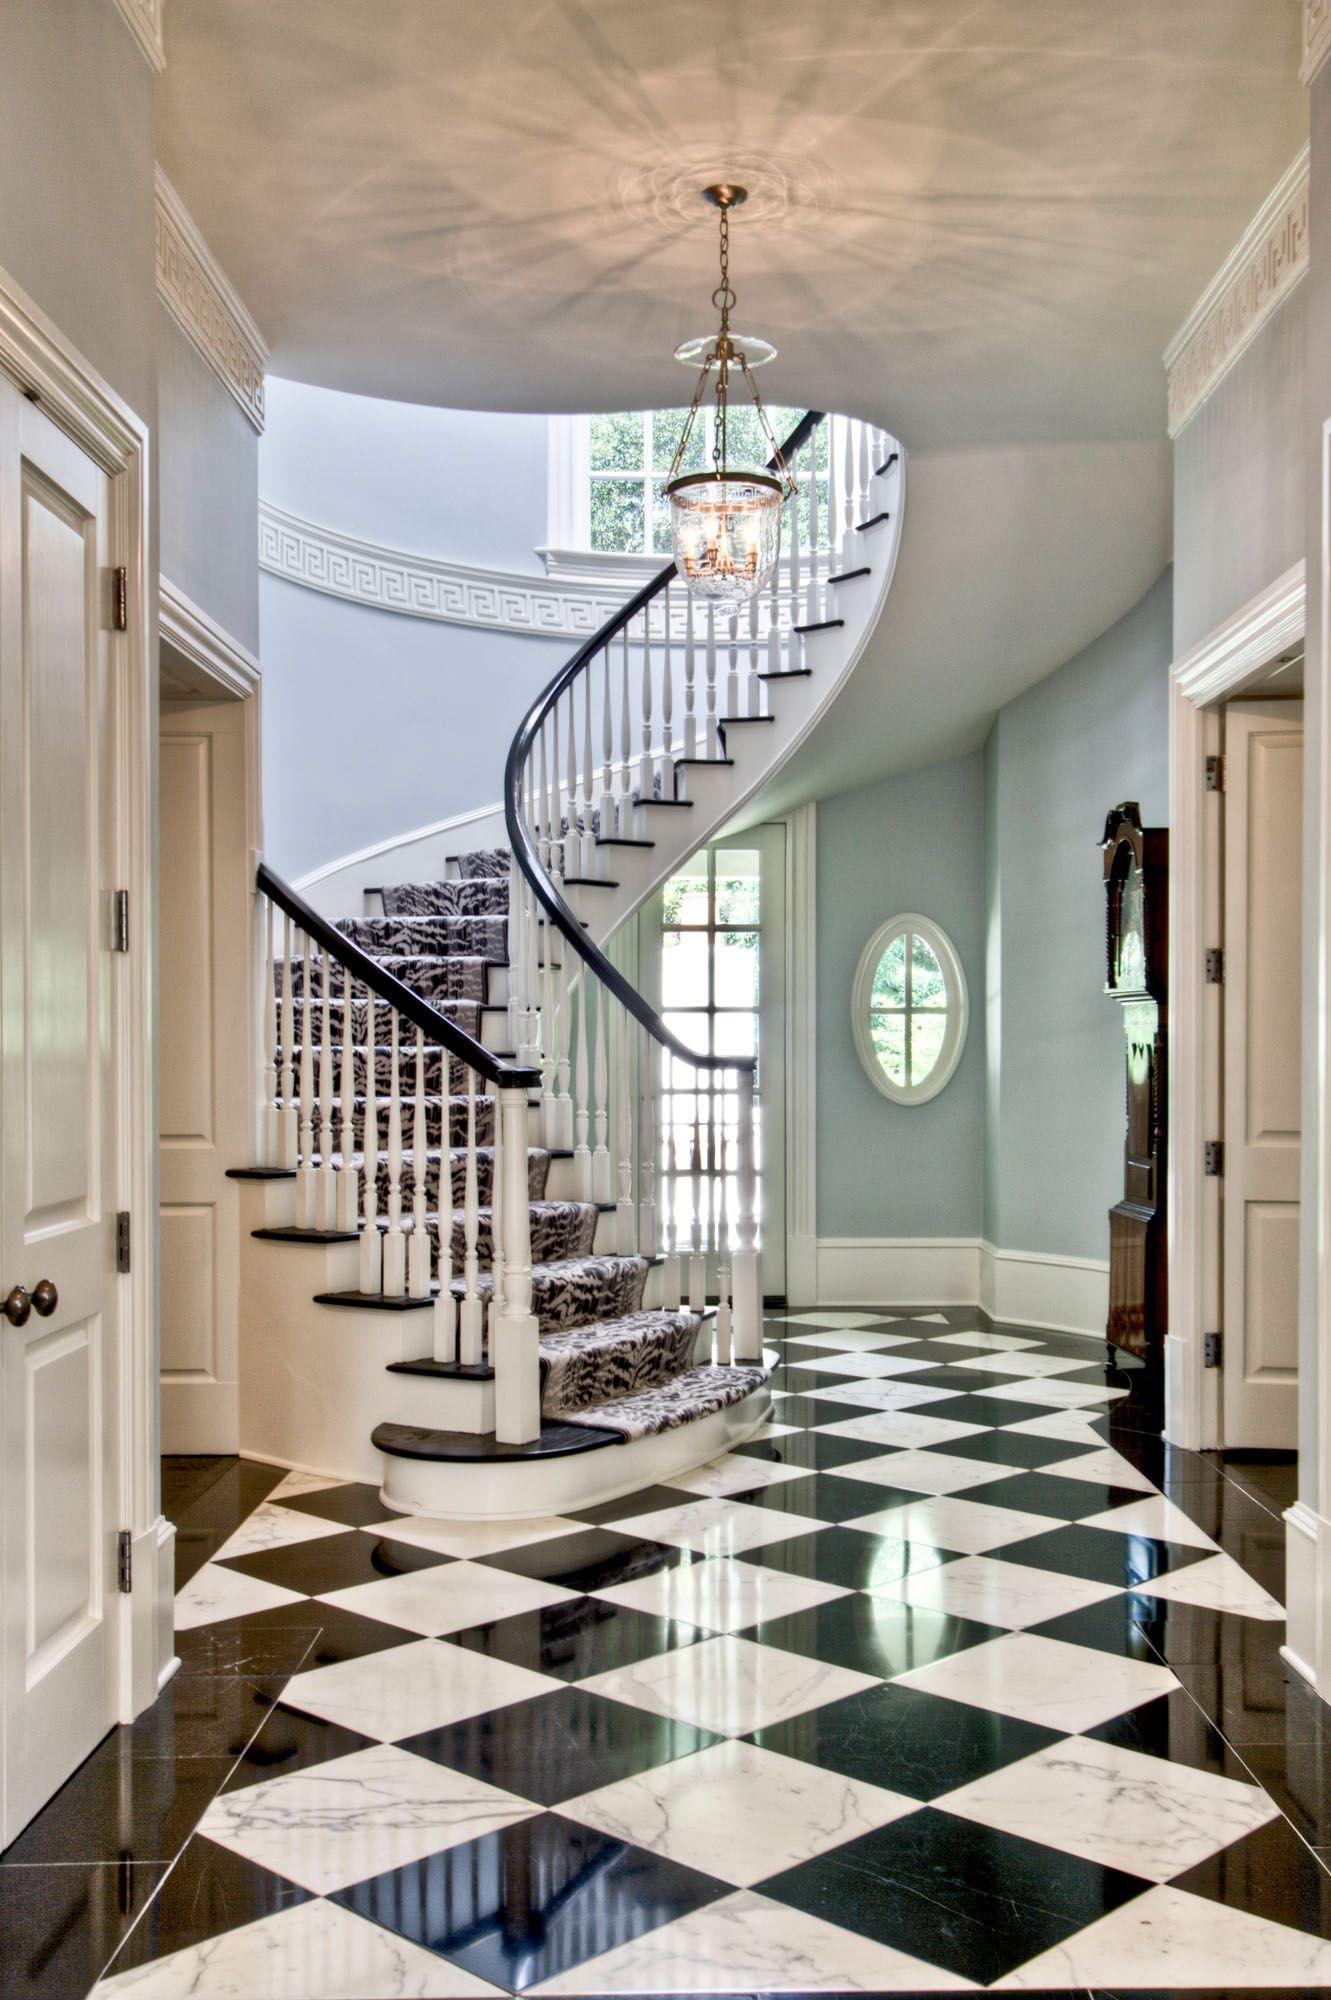 Best Harrison Design Stairs White Marble Floor Dream House 400 x 300